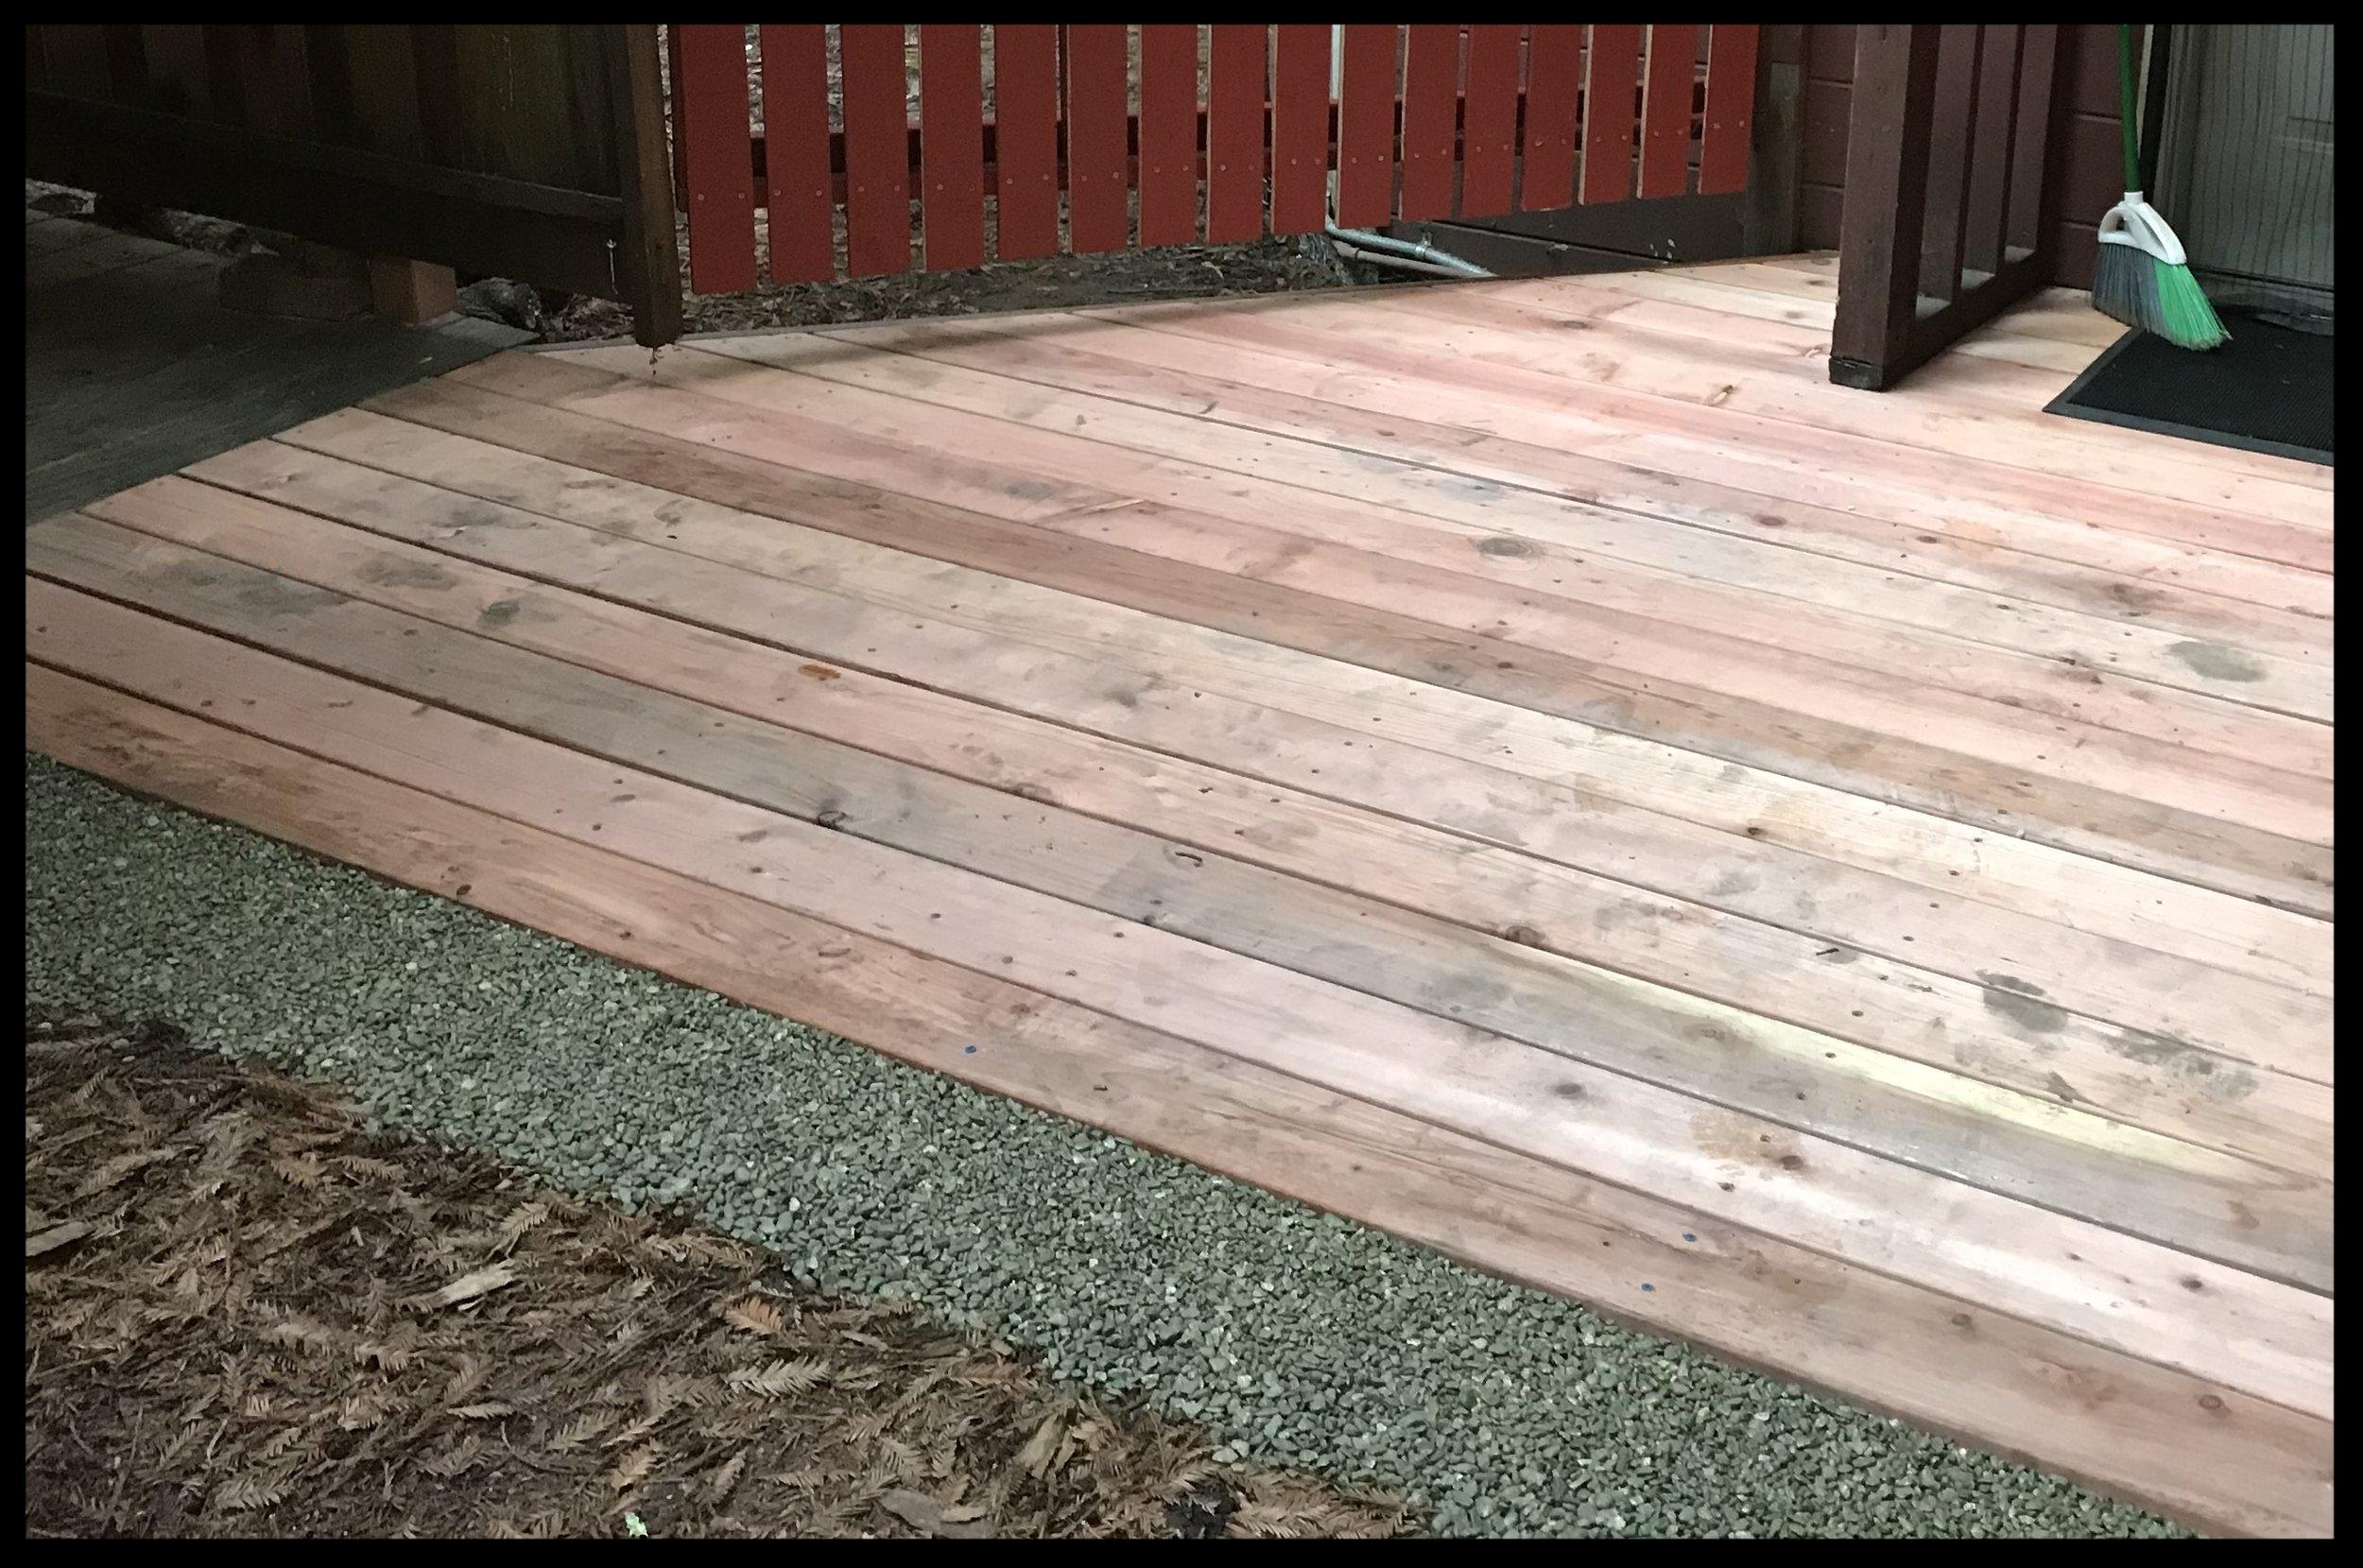 Remodelled Redwood Deck in Santa Cruz